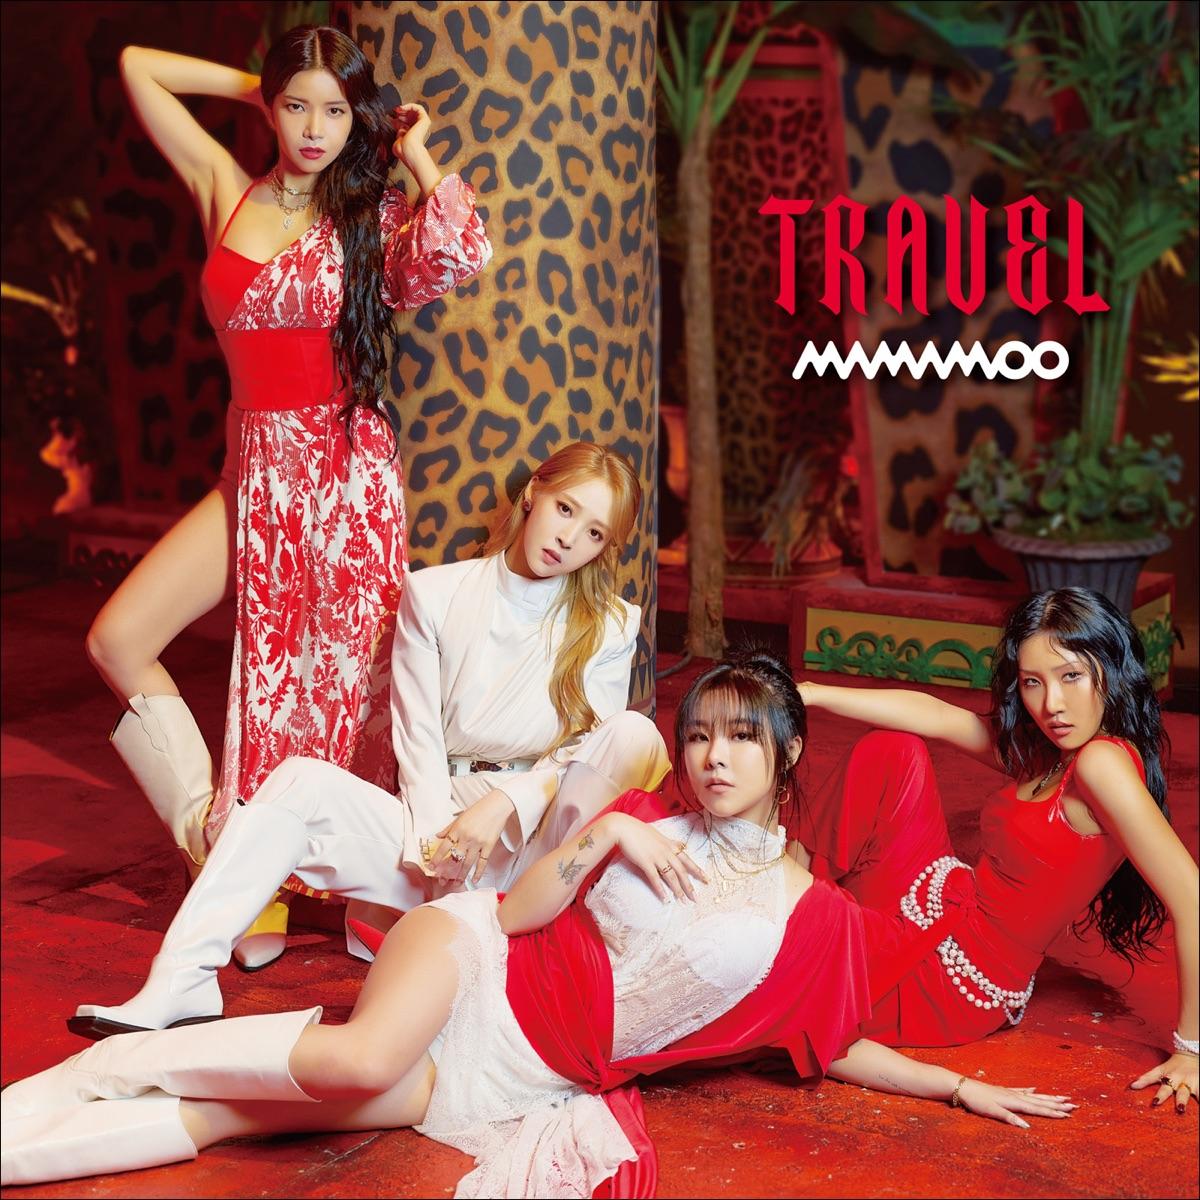 『MAMAMOO - AYA -Japanese ver.- 歌詞』収録の『TRAVEL -Japan Edition-』ジャケット